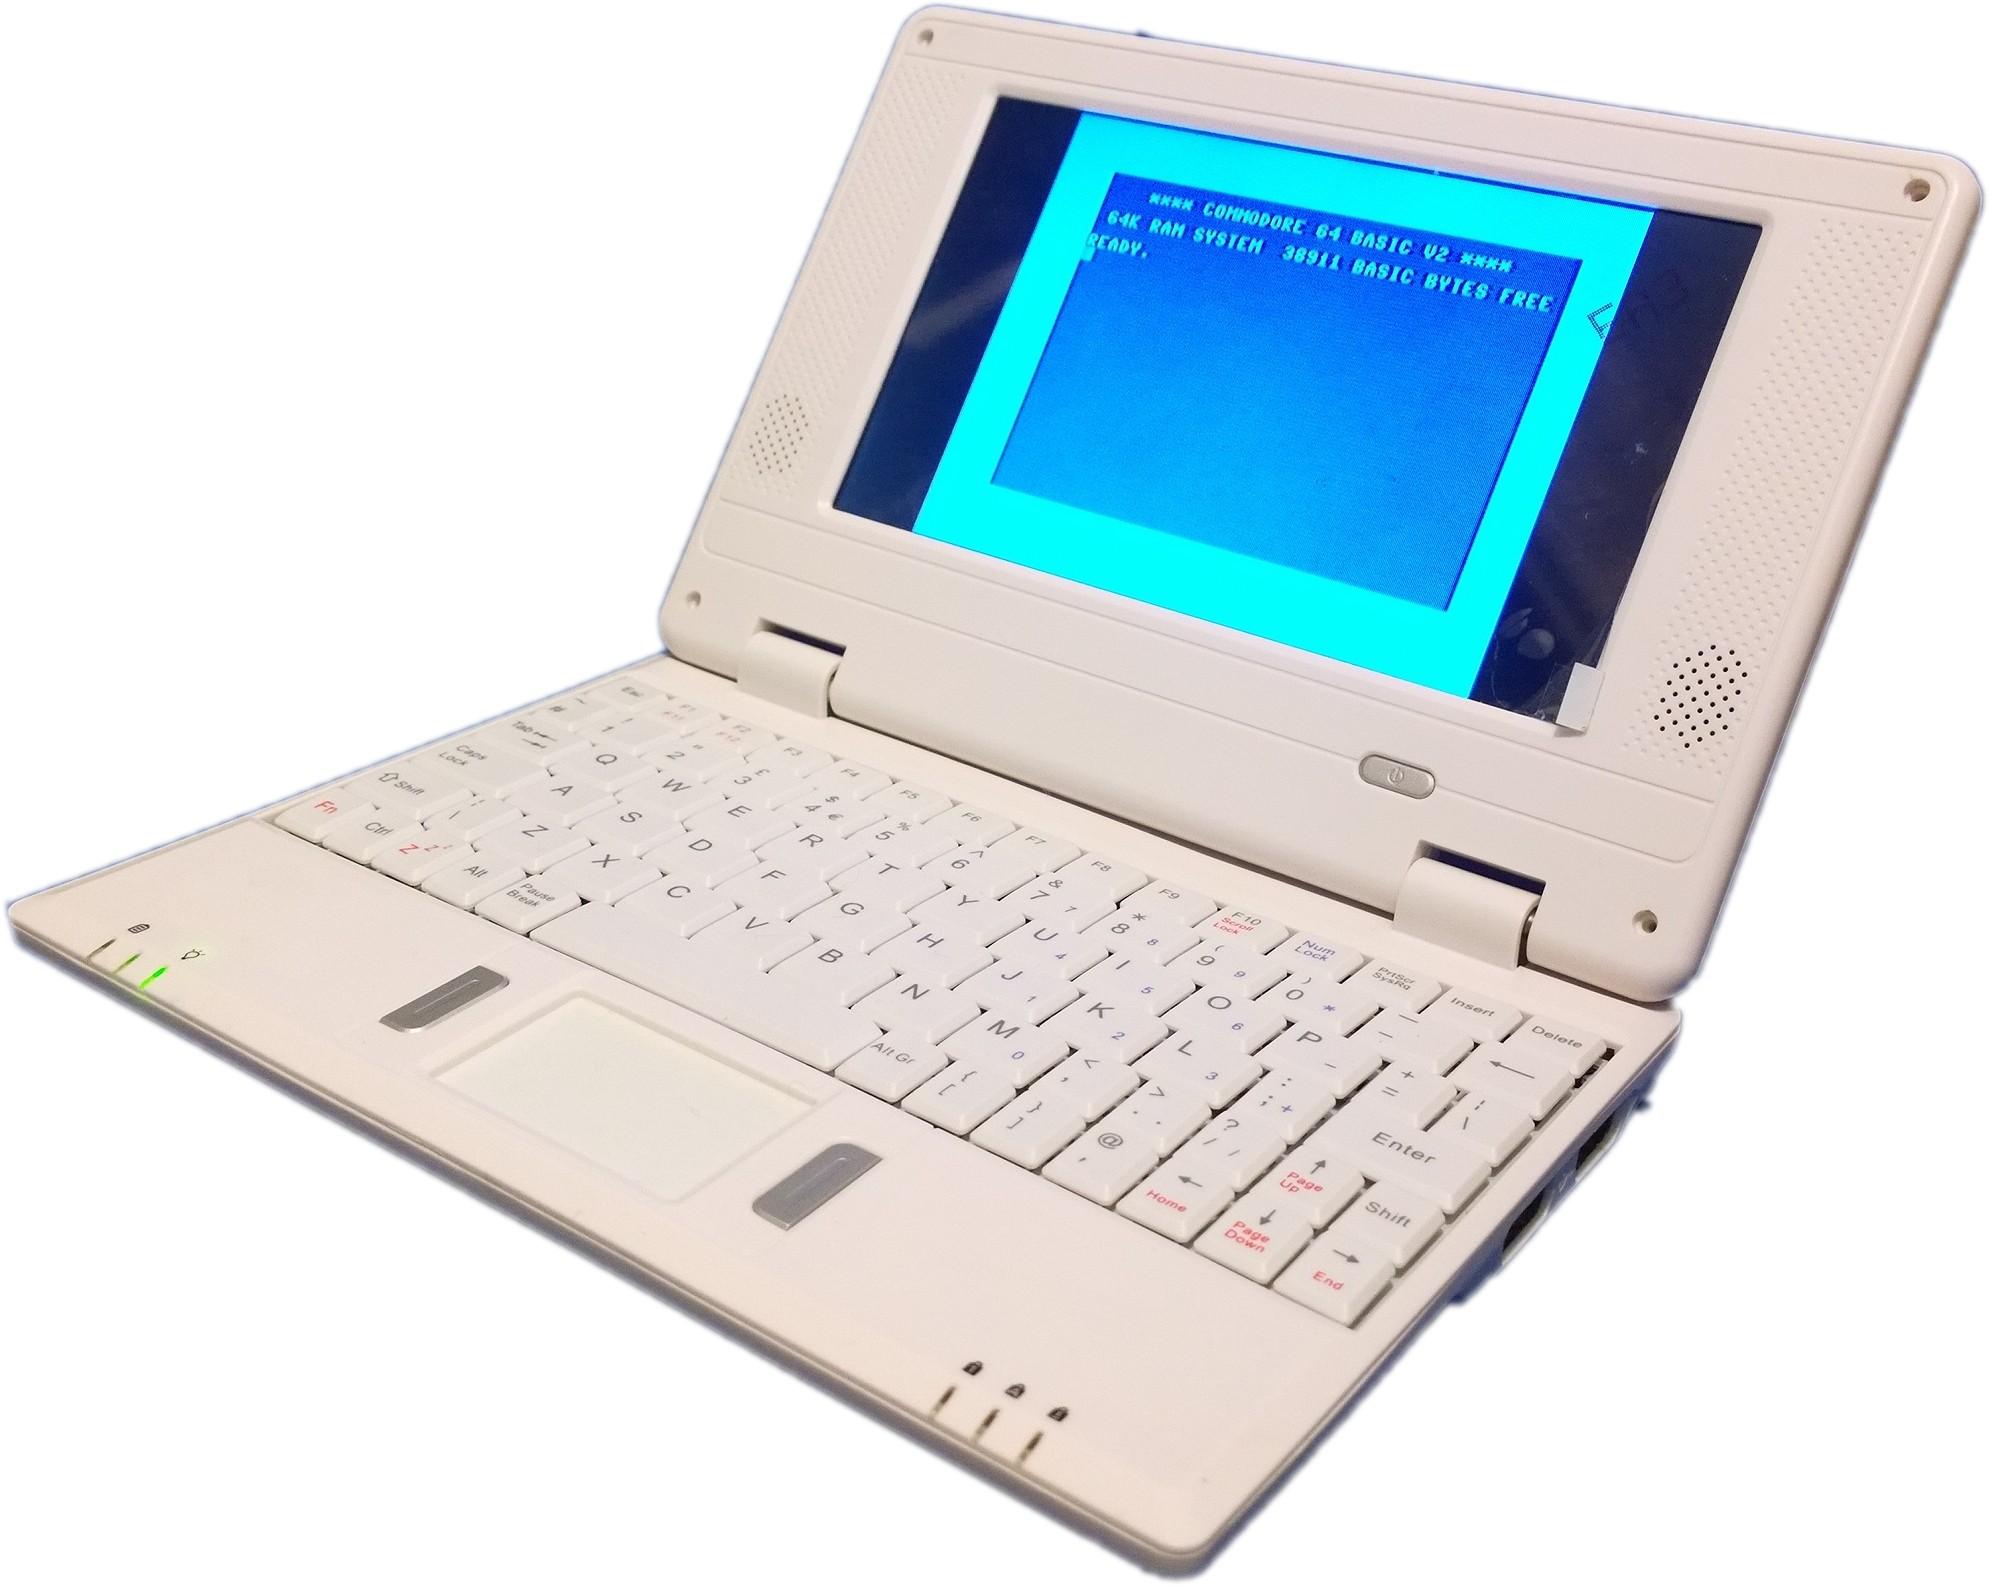 C64p - C64DTV Based laptop